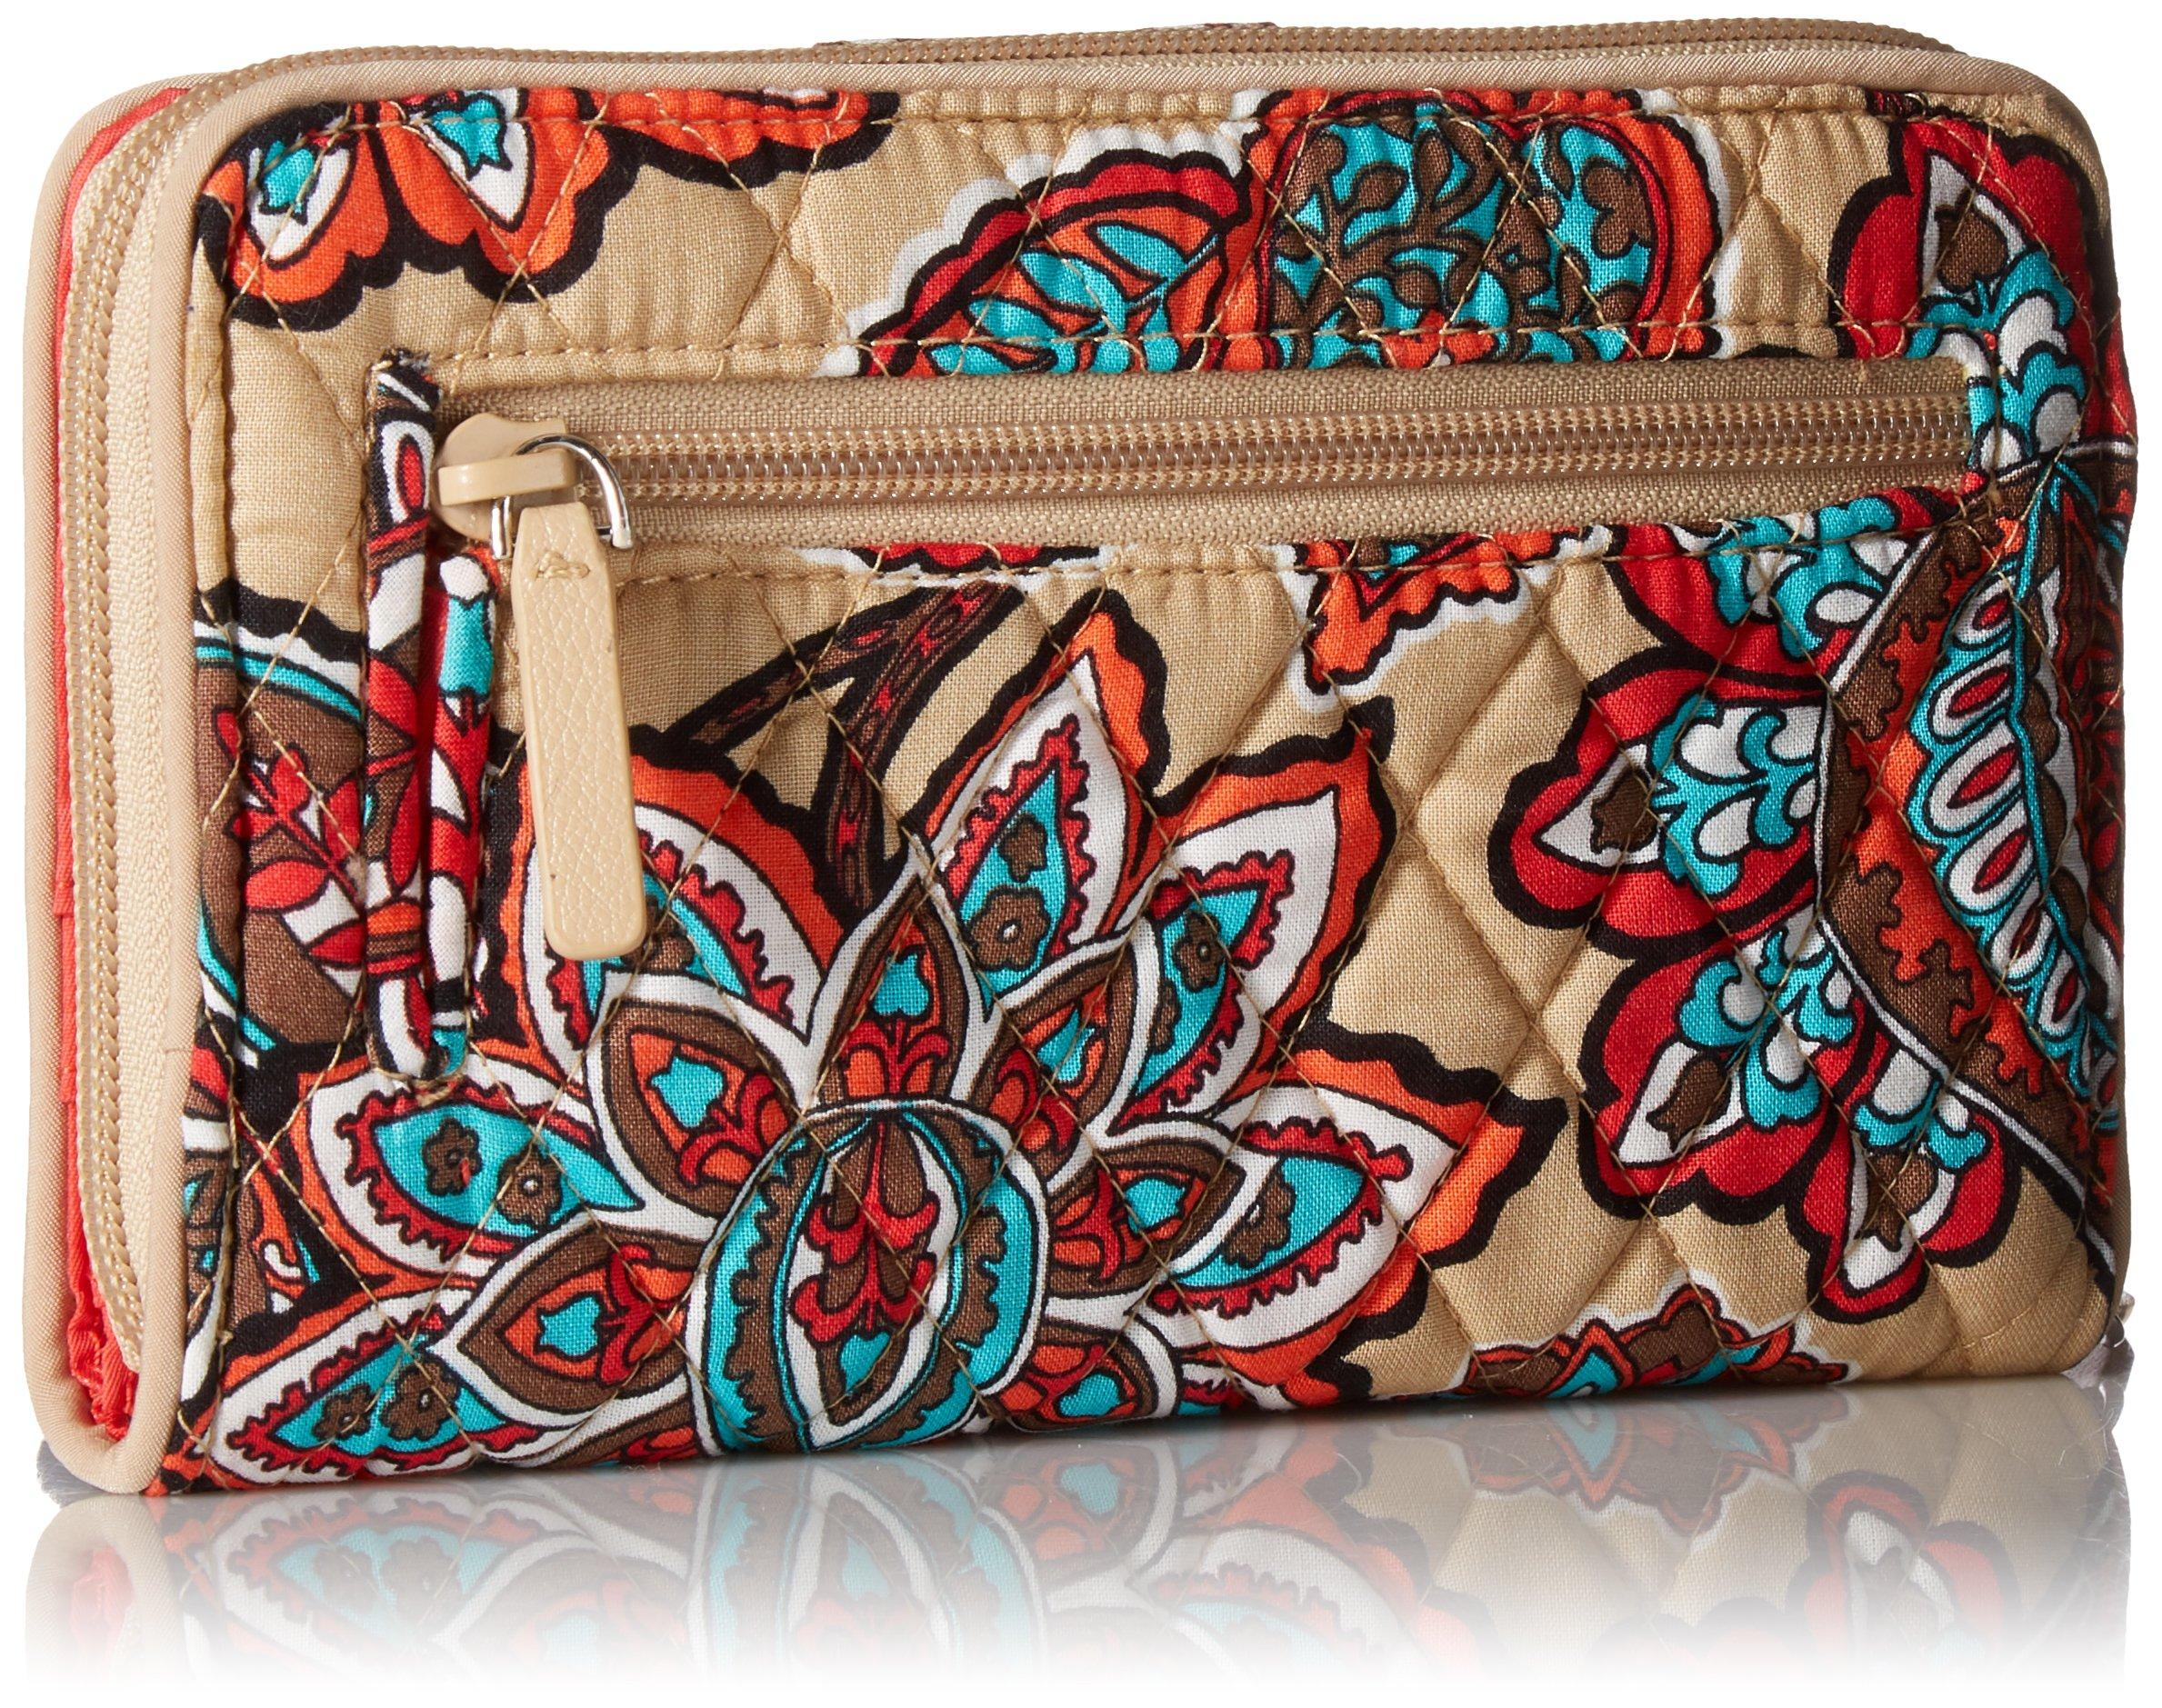 Vera Bradley Rfid Turnlock Wallet, Signature Cotton, Desert Floral + 1.50 Power by Vera Bradley (Image #2)